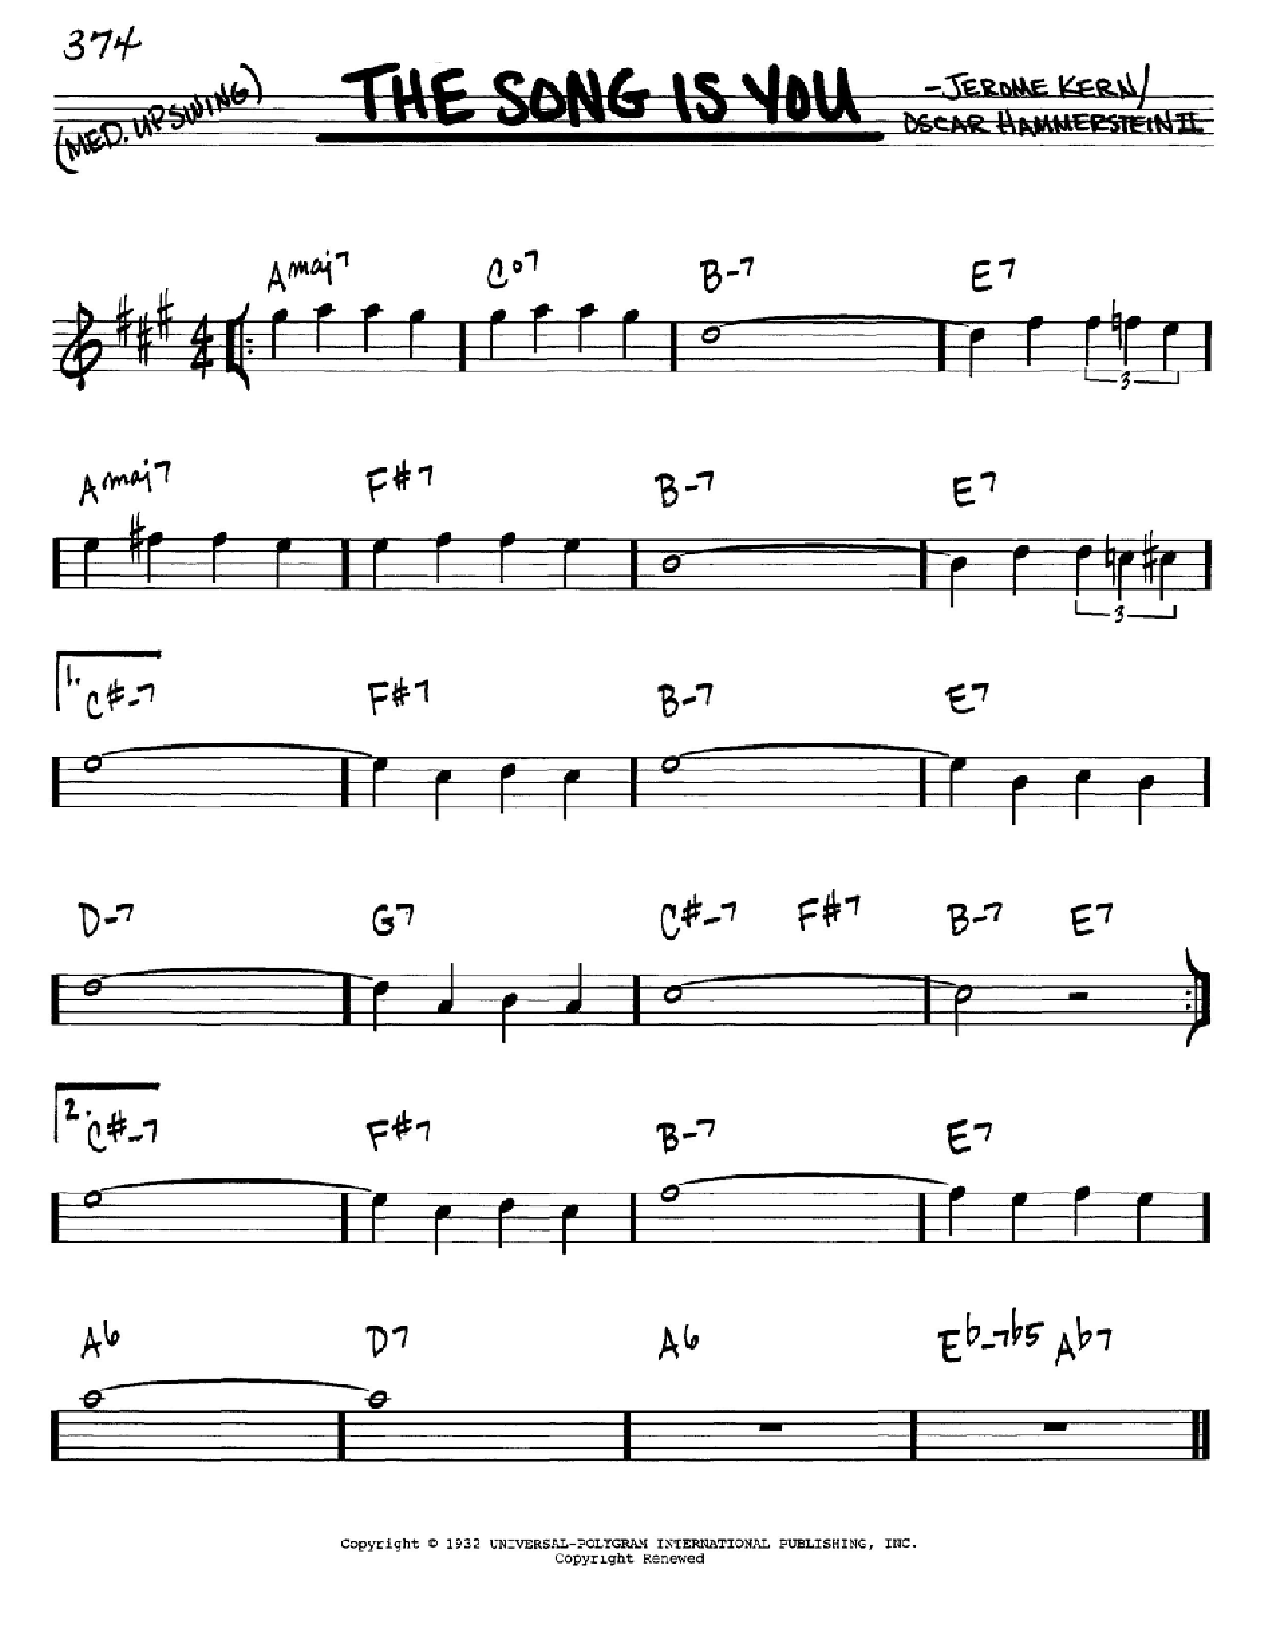 Partition autre The Song Is You de Jerome Kern - Real Book, Melodie et Accords, Inst. En Mib